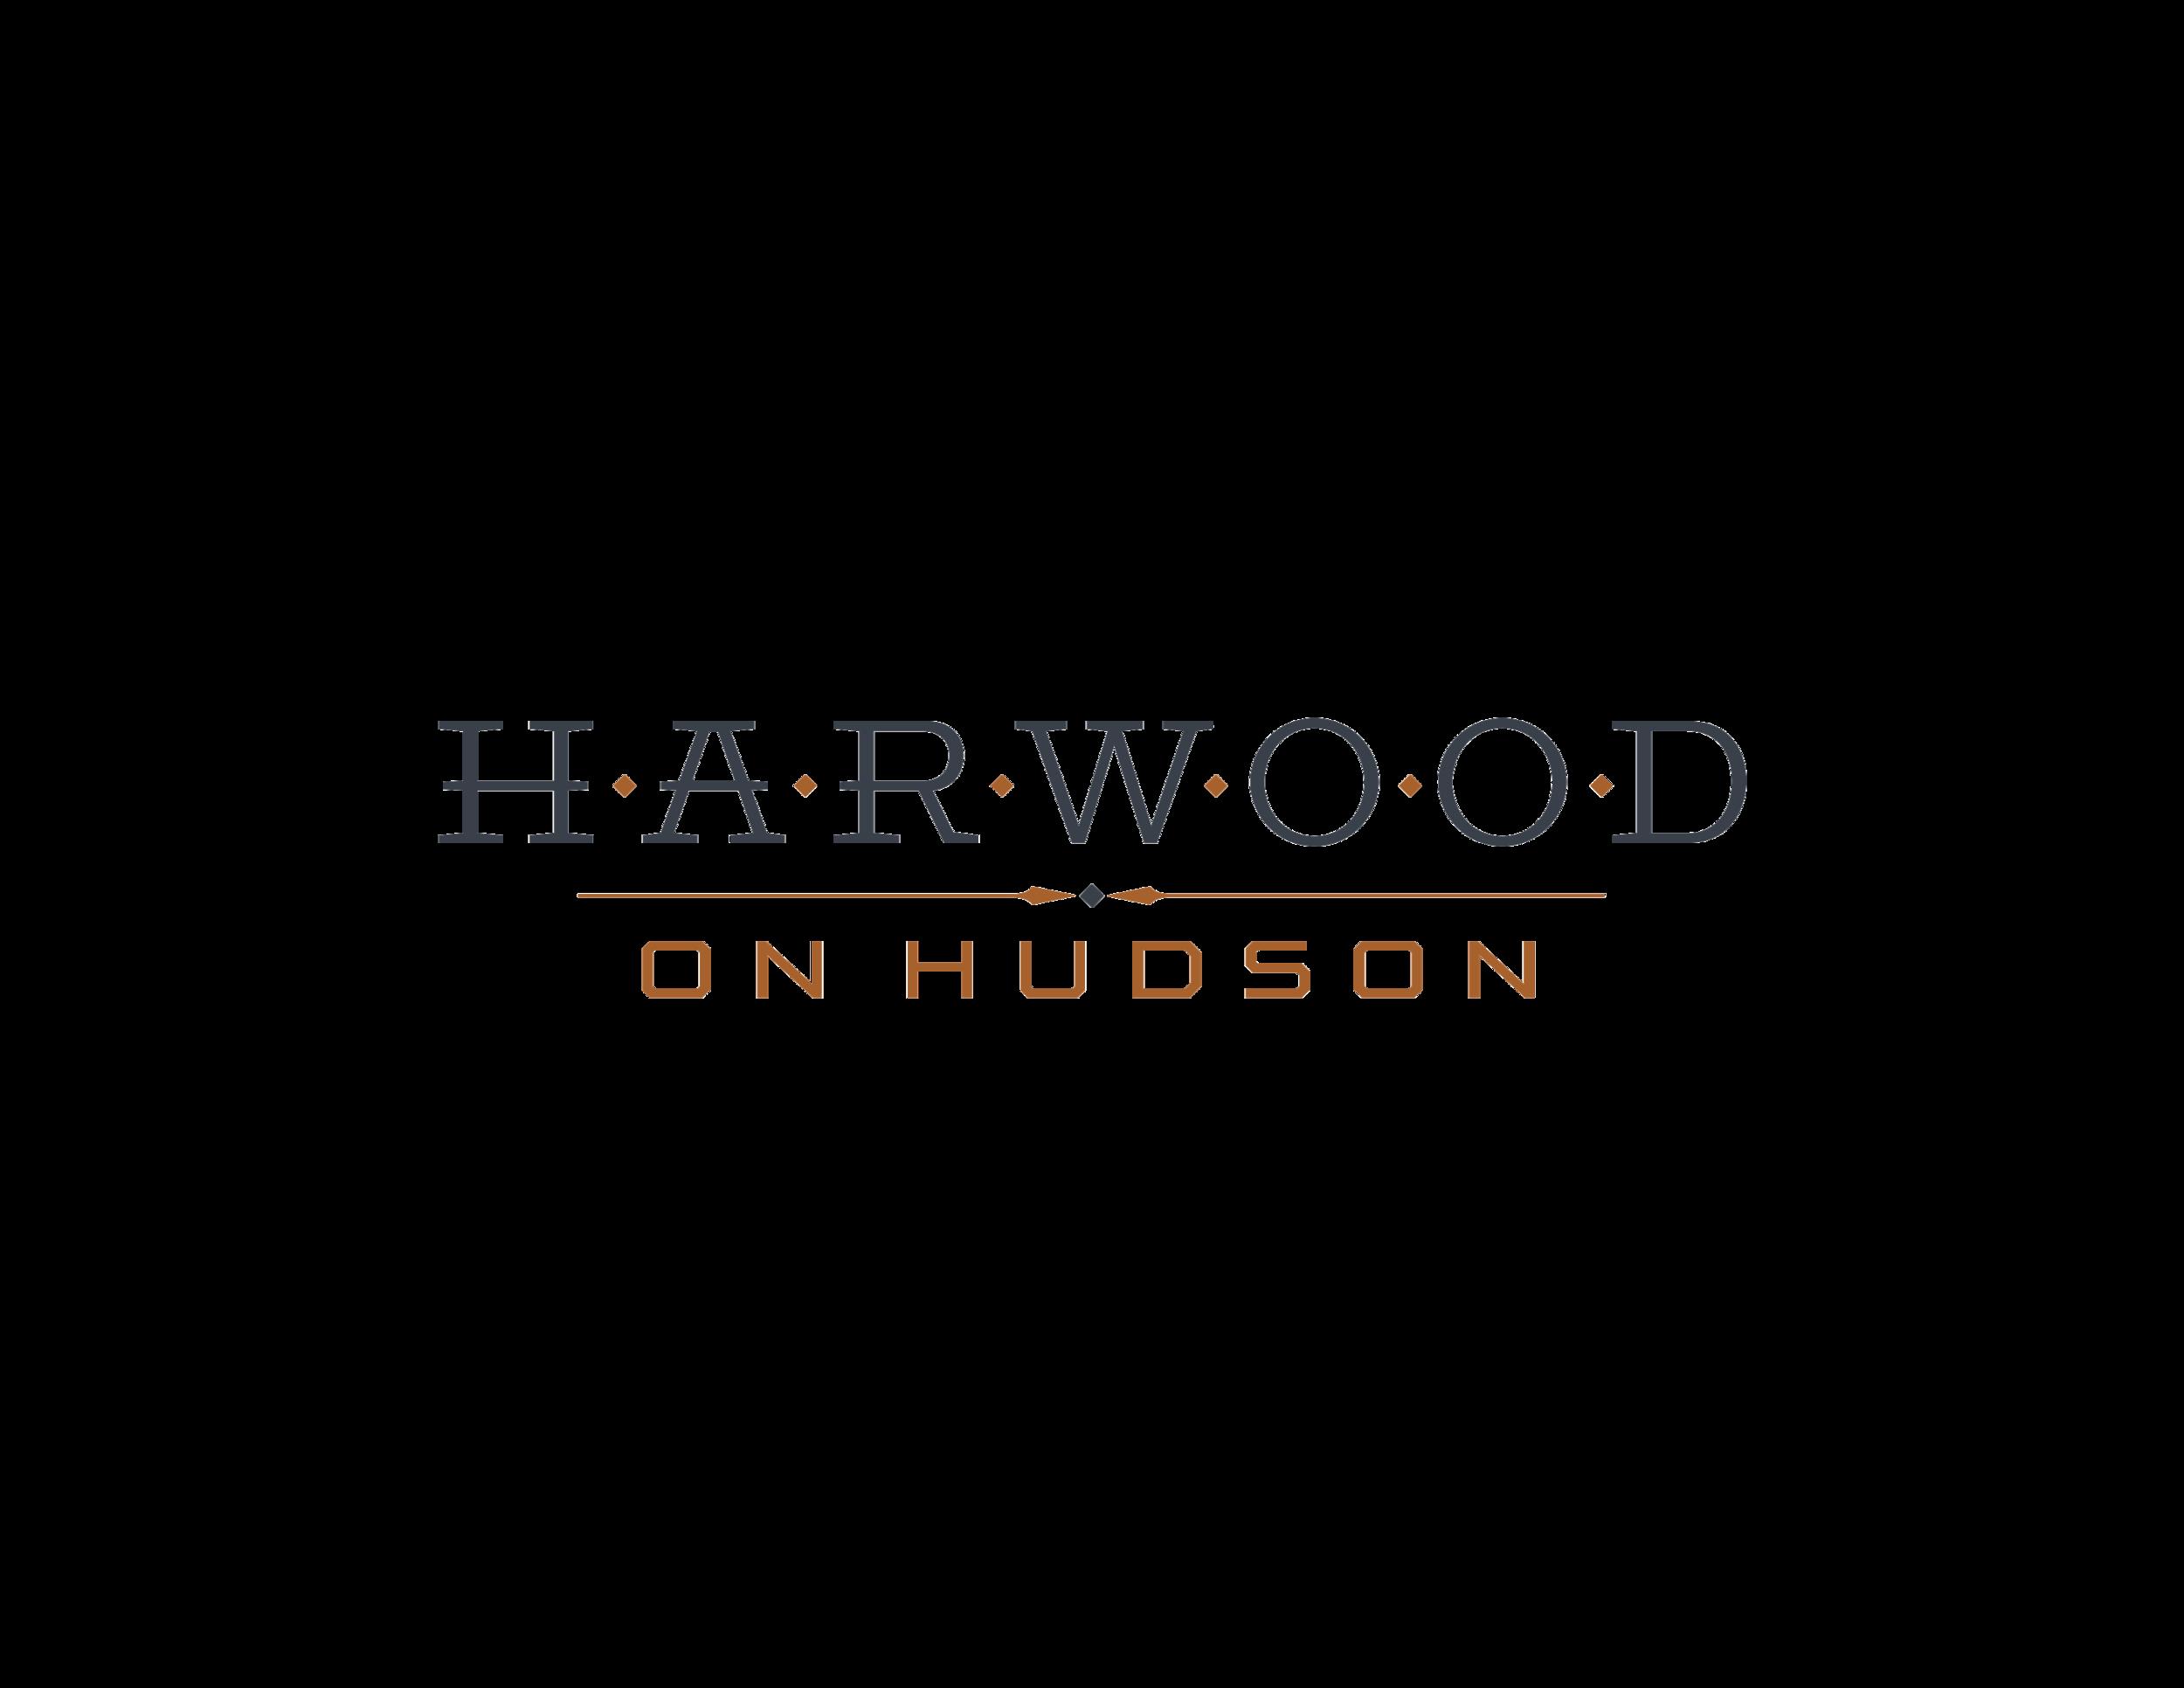 Harwood_logo_web1.png